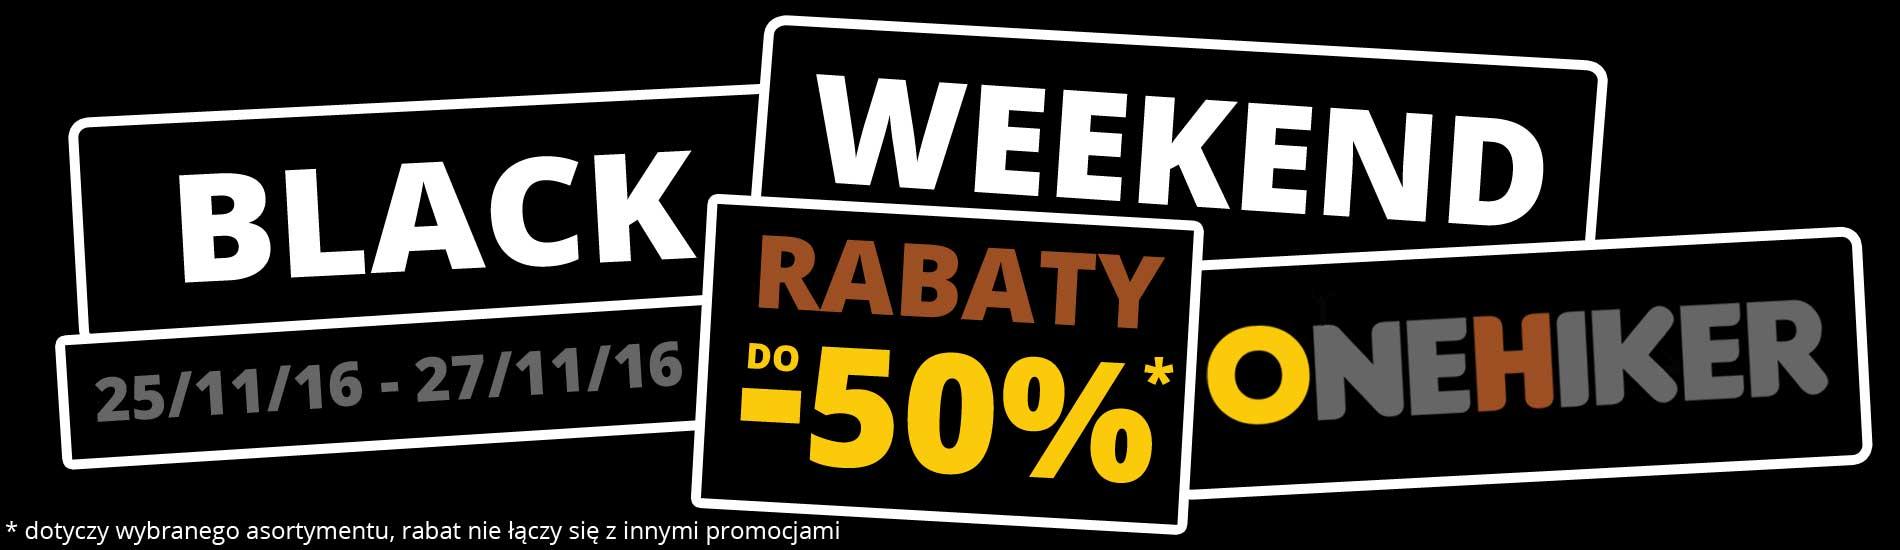 Black Friday w Onehiker.pl do -50%